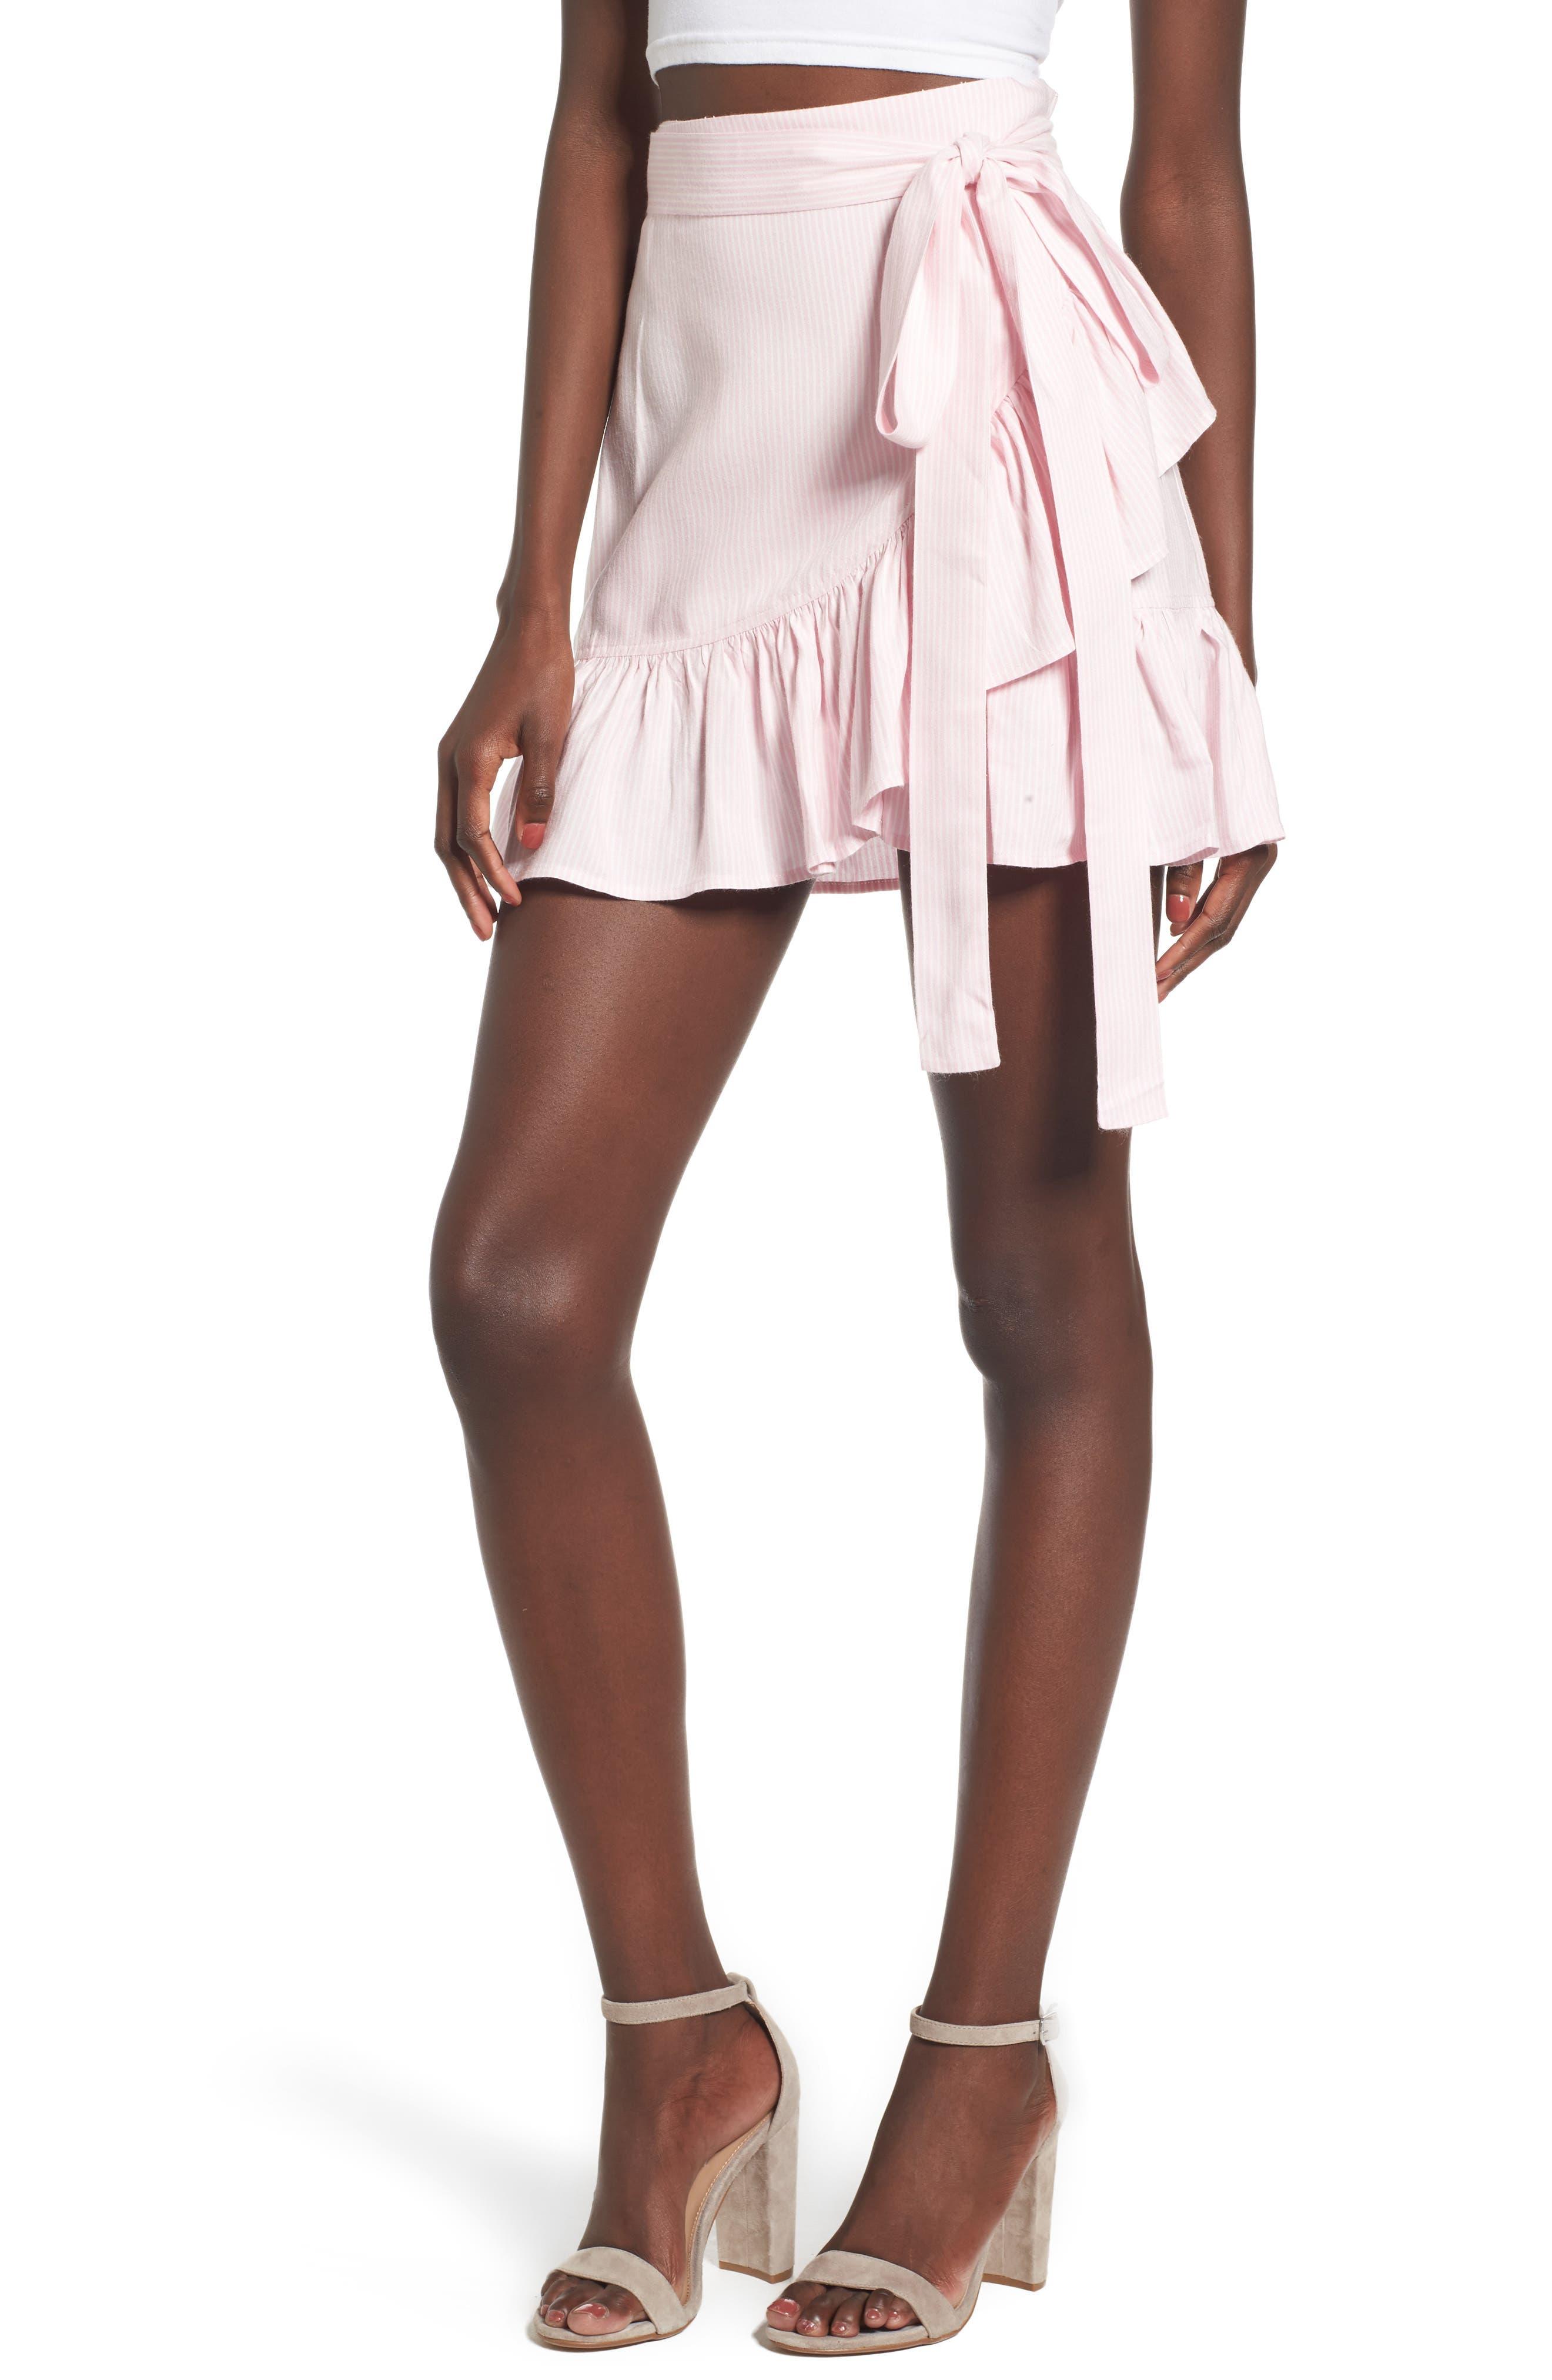 ARRIVE Vienna Ruffle Wrap Skirt